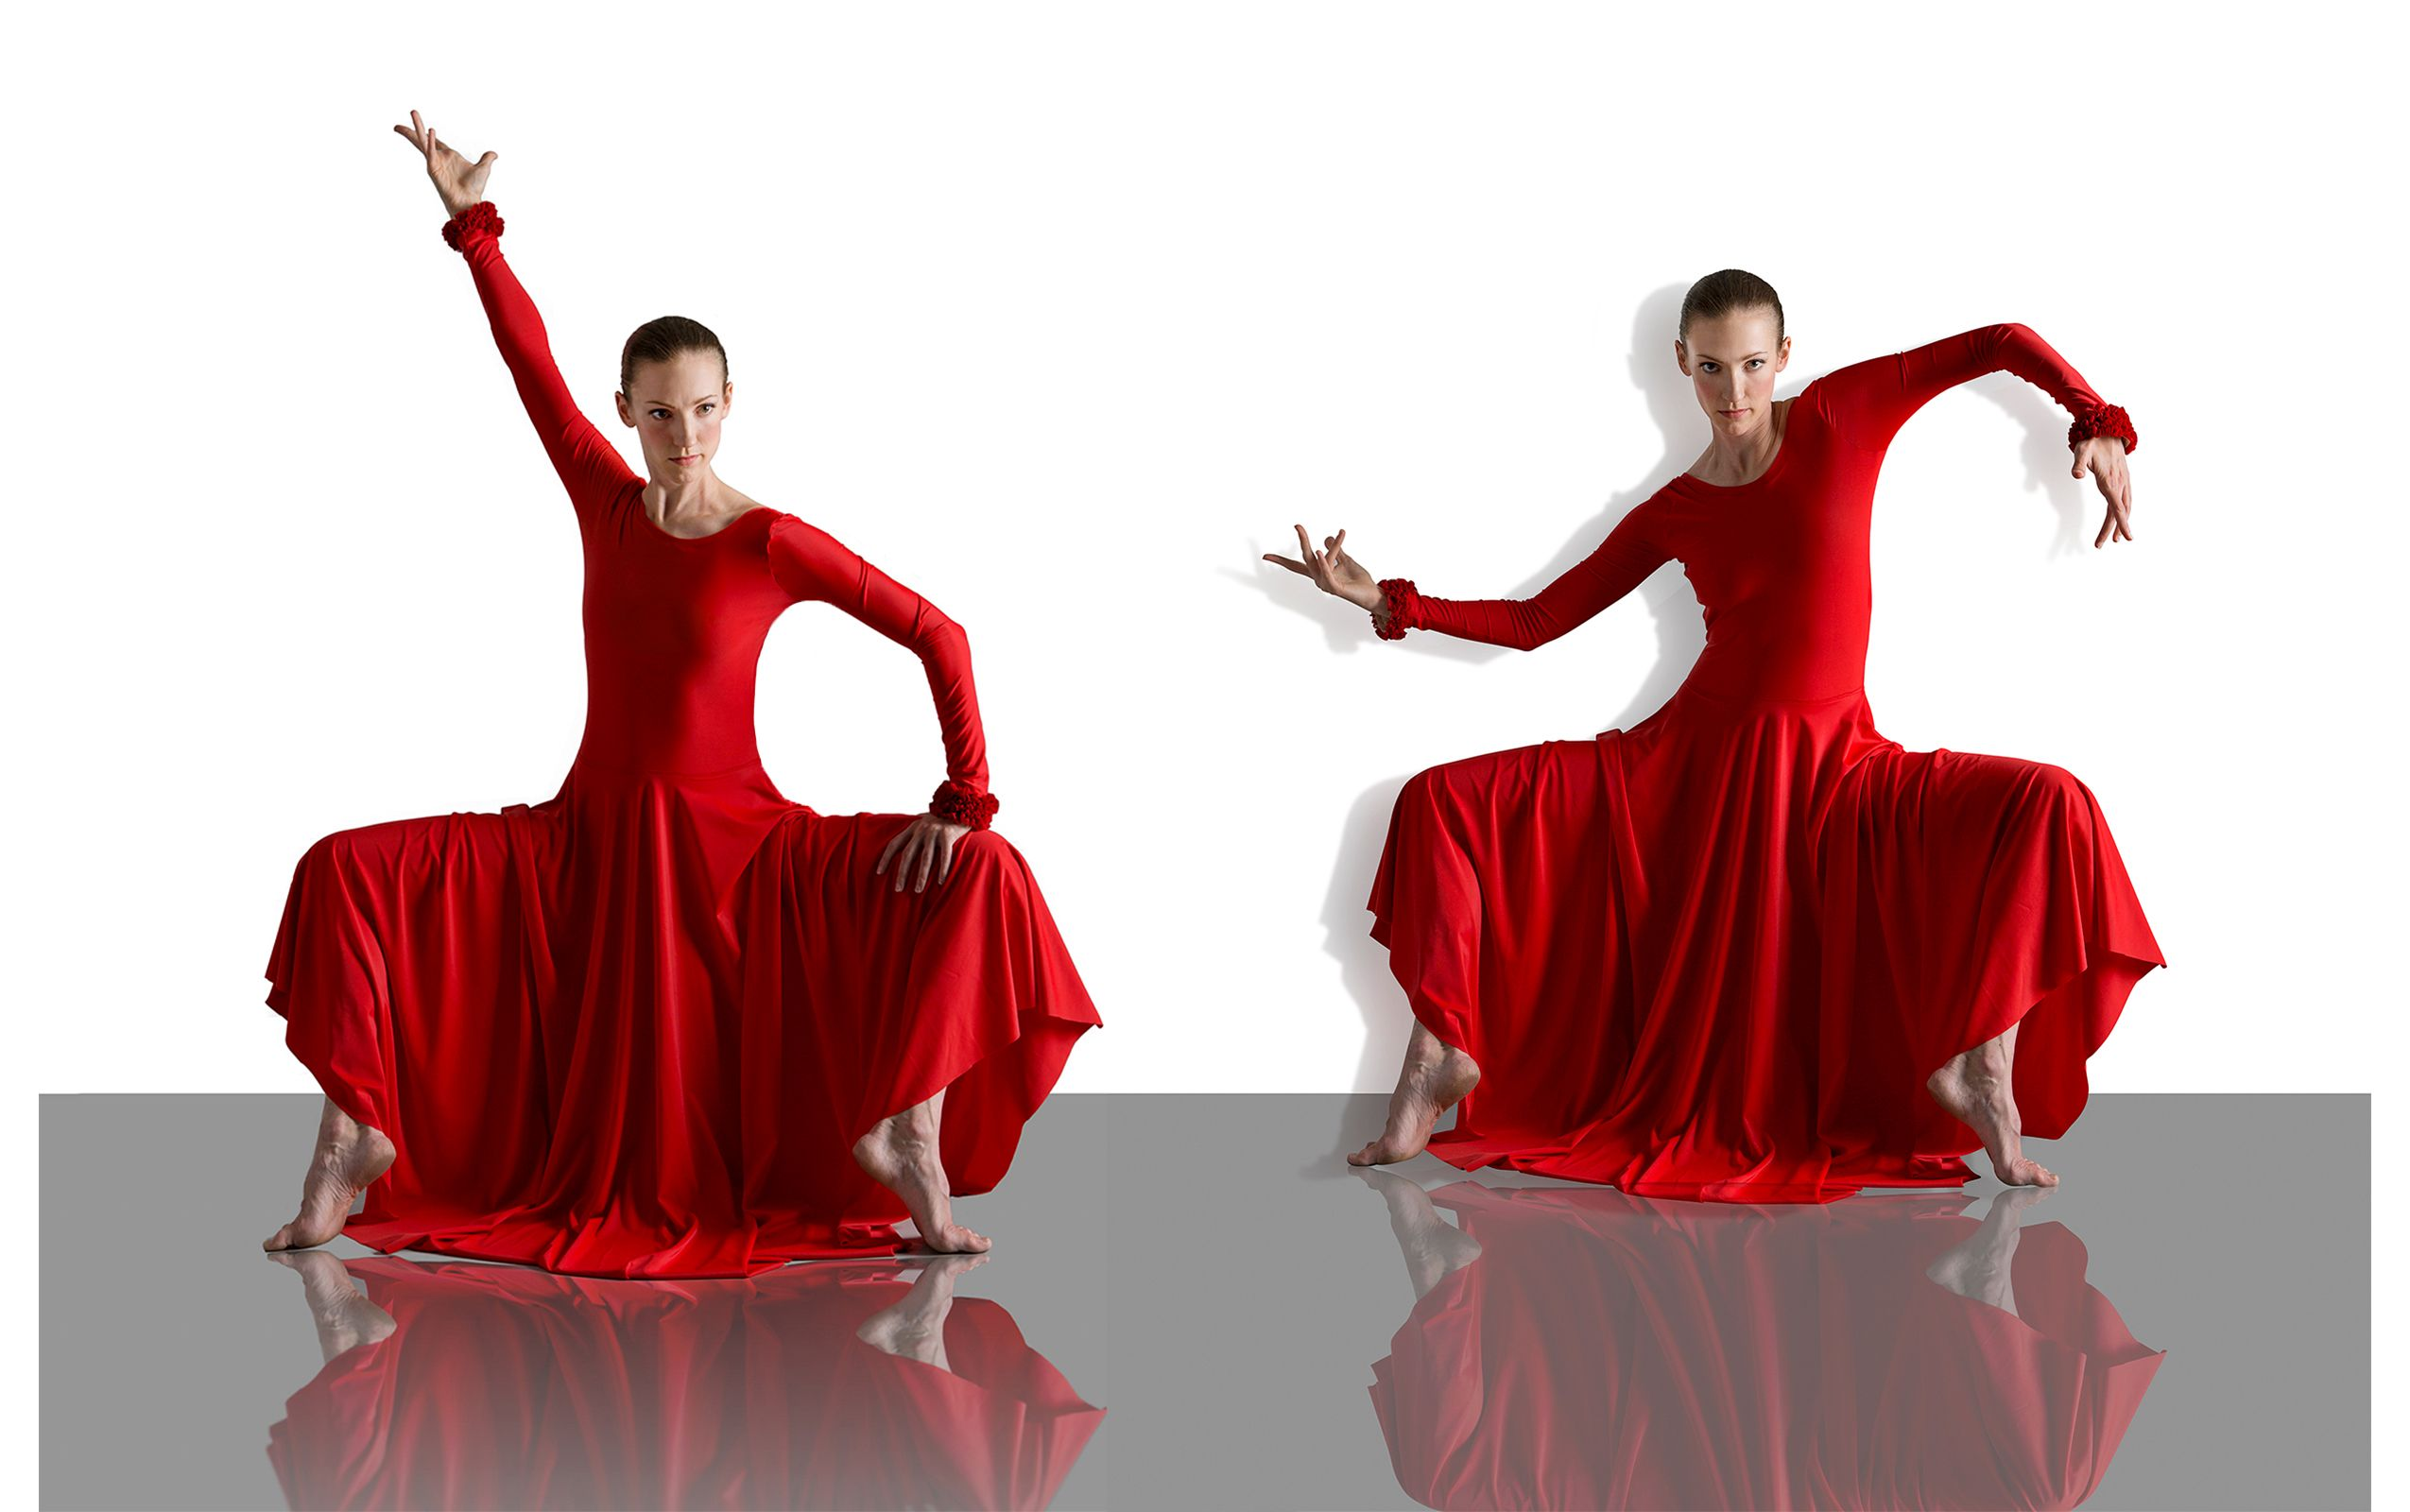 Sarah_sitting_Red_Dress_FW.jpg